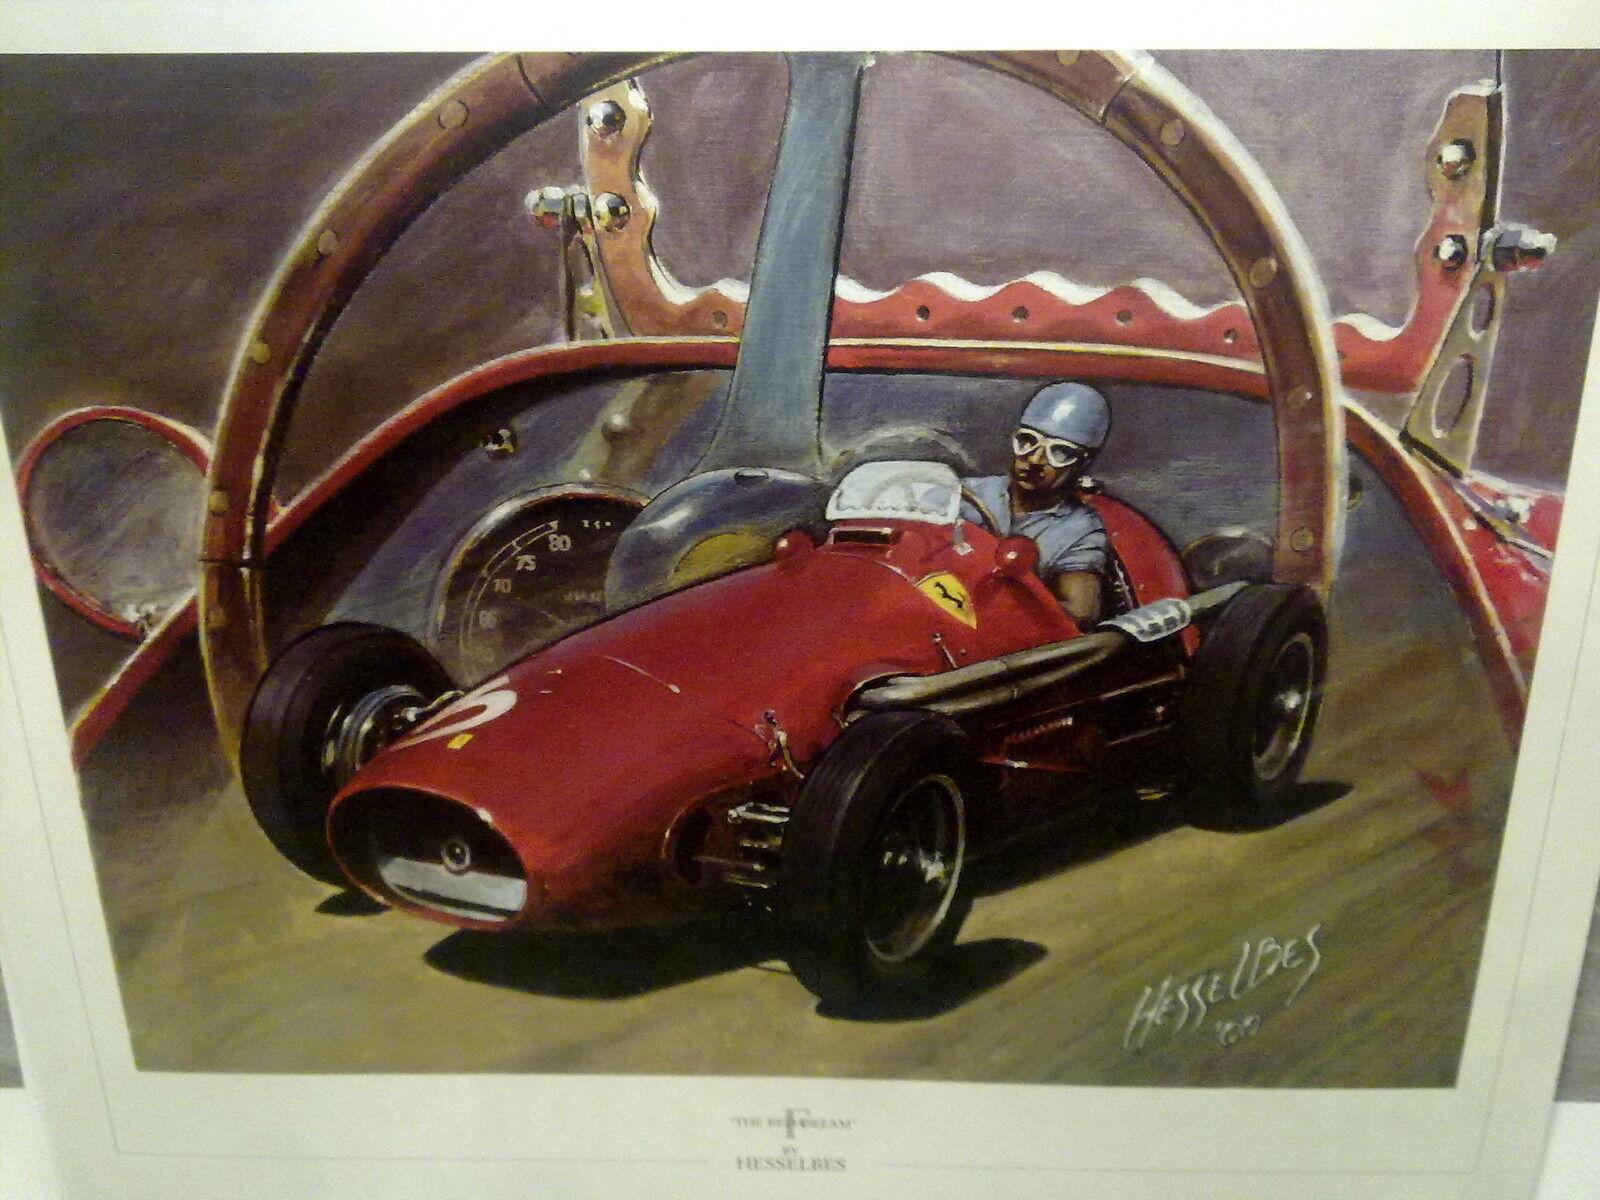 Ferrari 500 F2 (F1) 1952 Alberto Ascari by Hesselbes Hesselbes Hesselbes a9890a